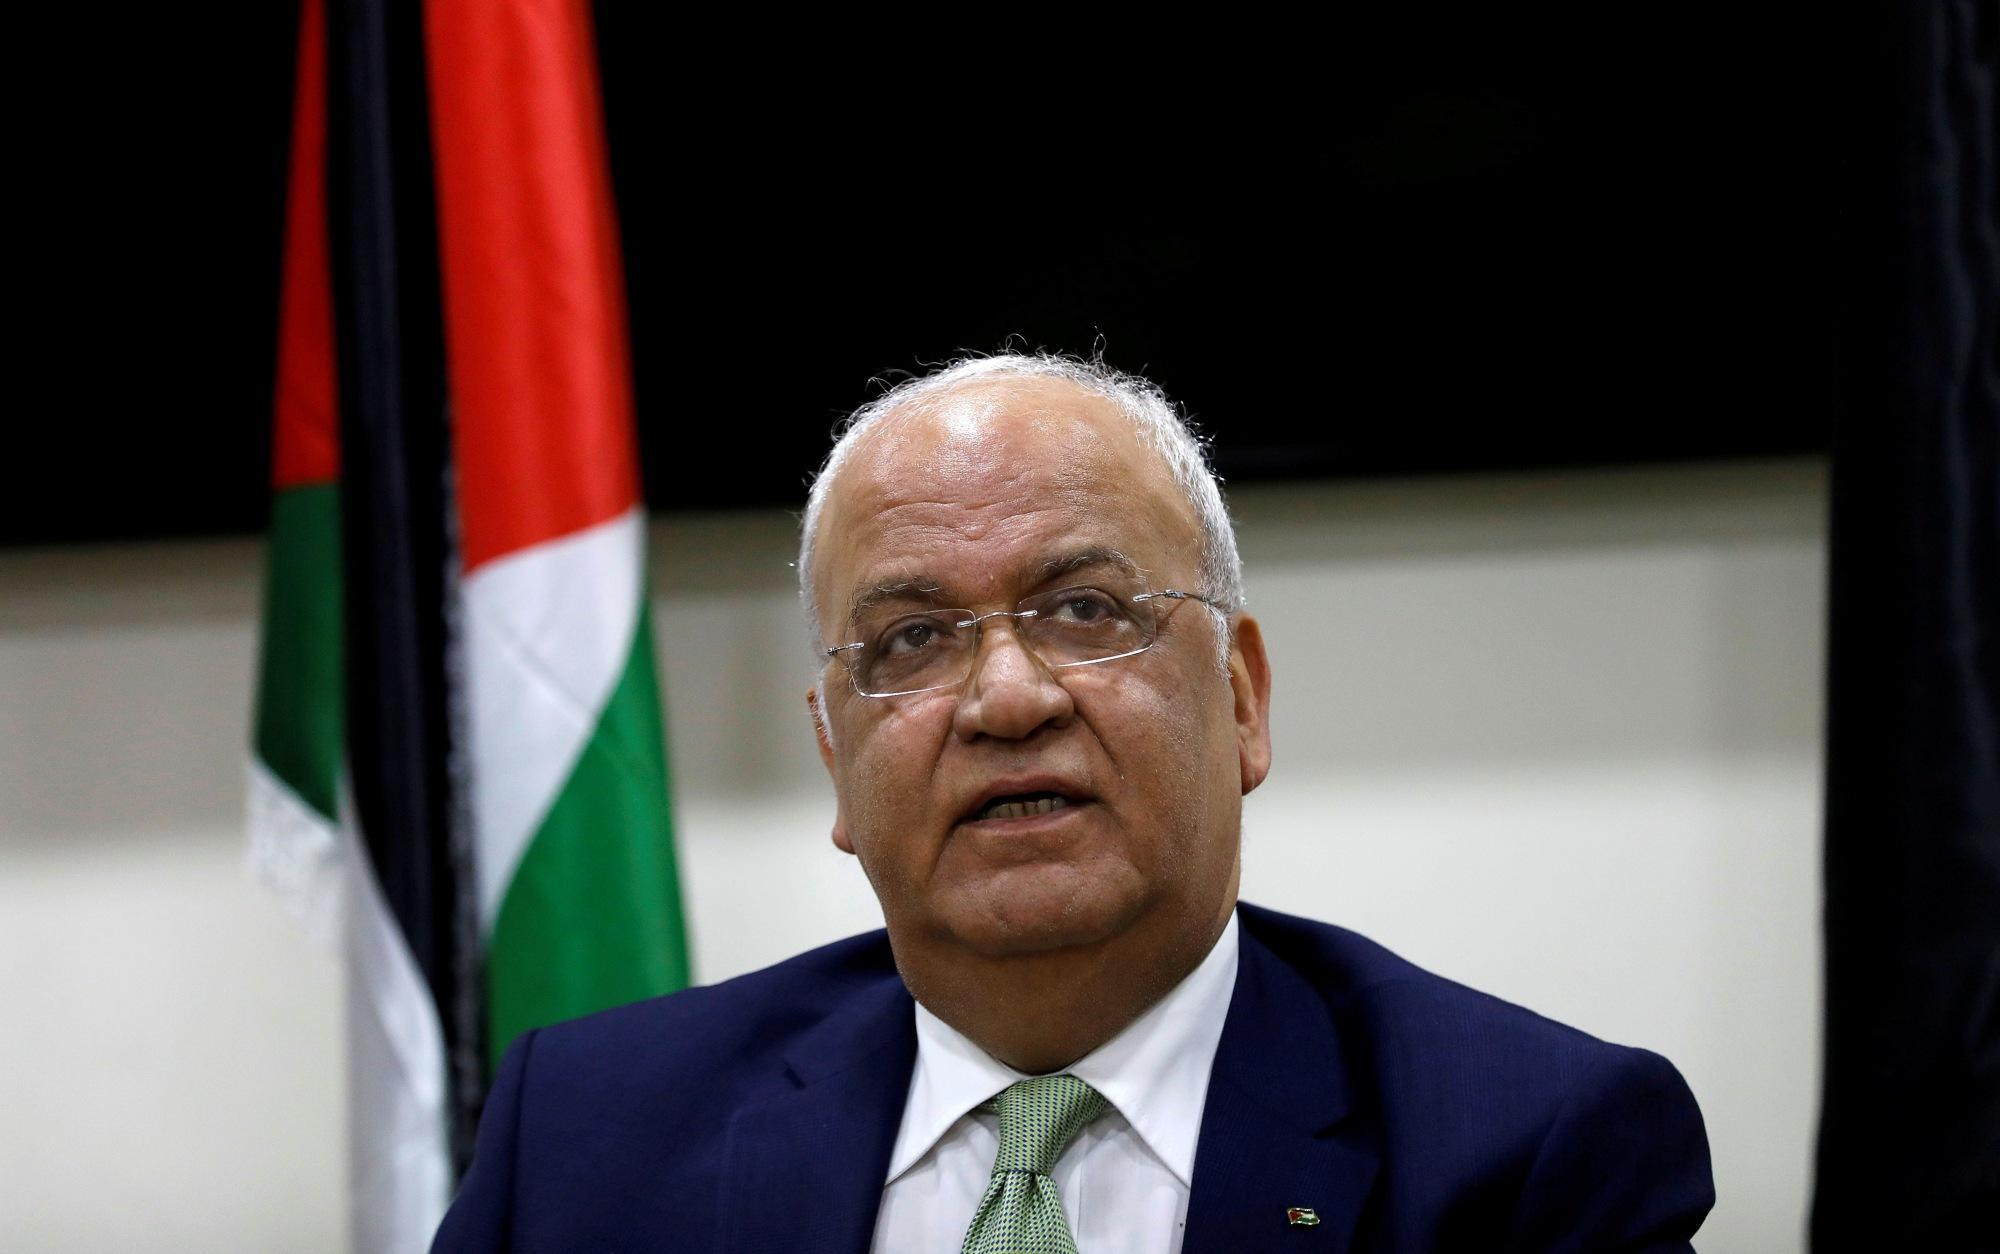 Senior PLO Official Erekat Taken to Israeli Hospital After Coronavirus Condition Worsens